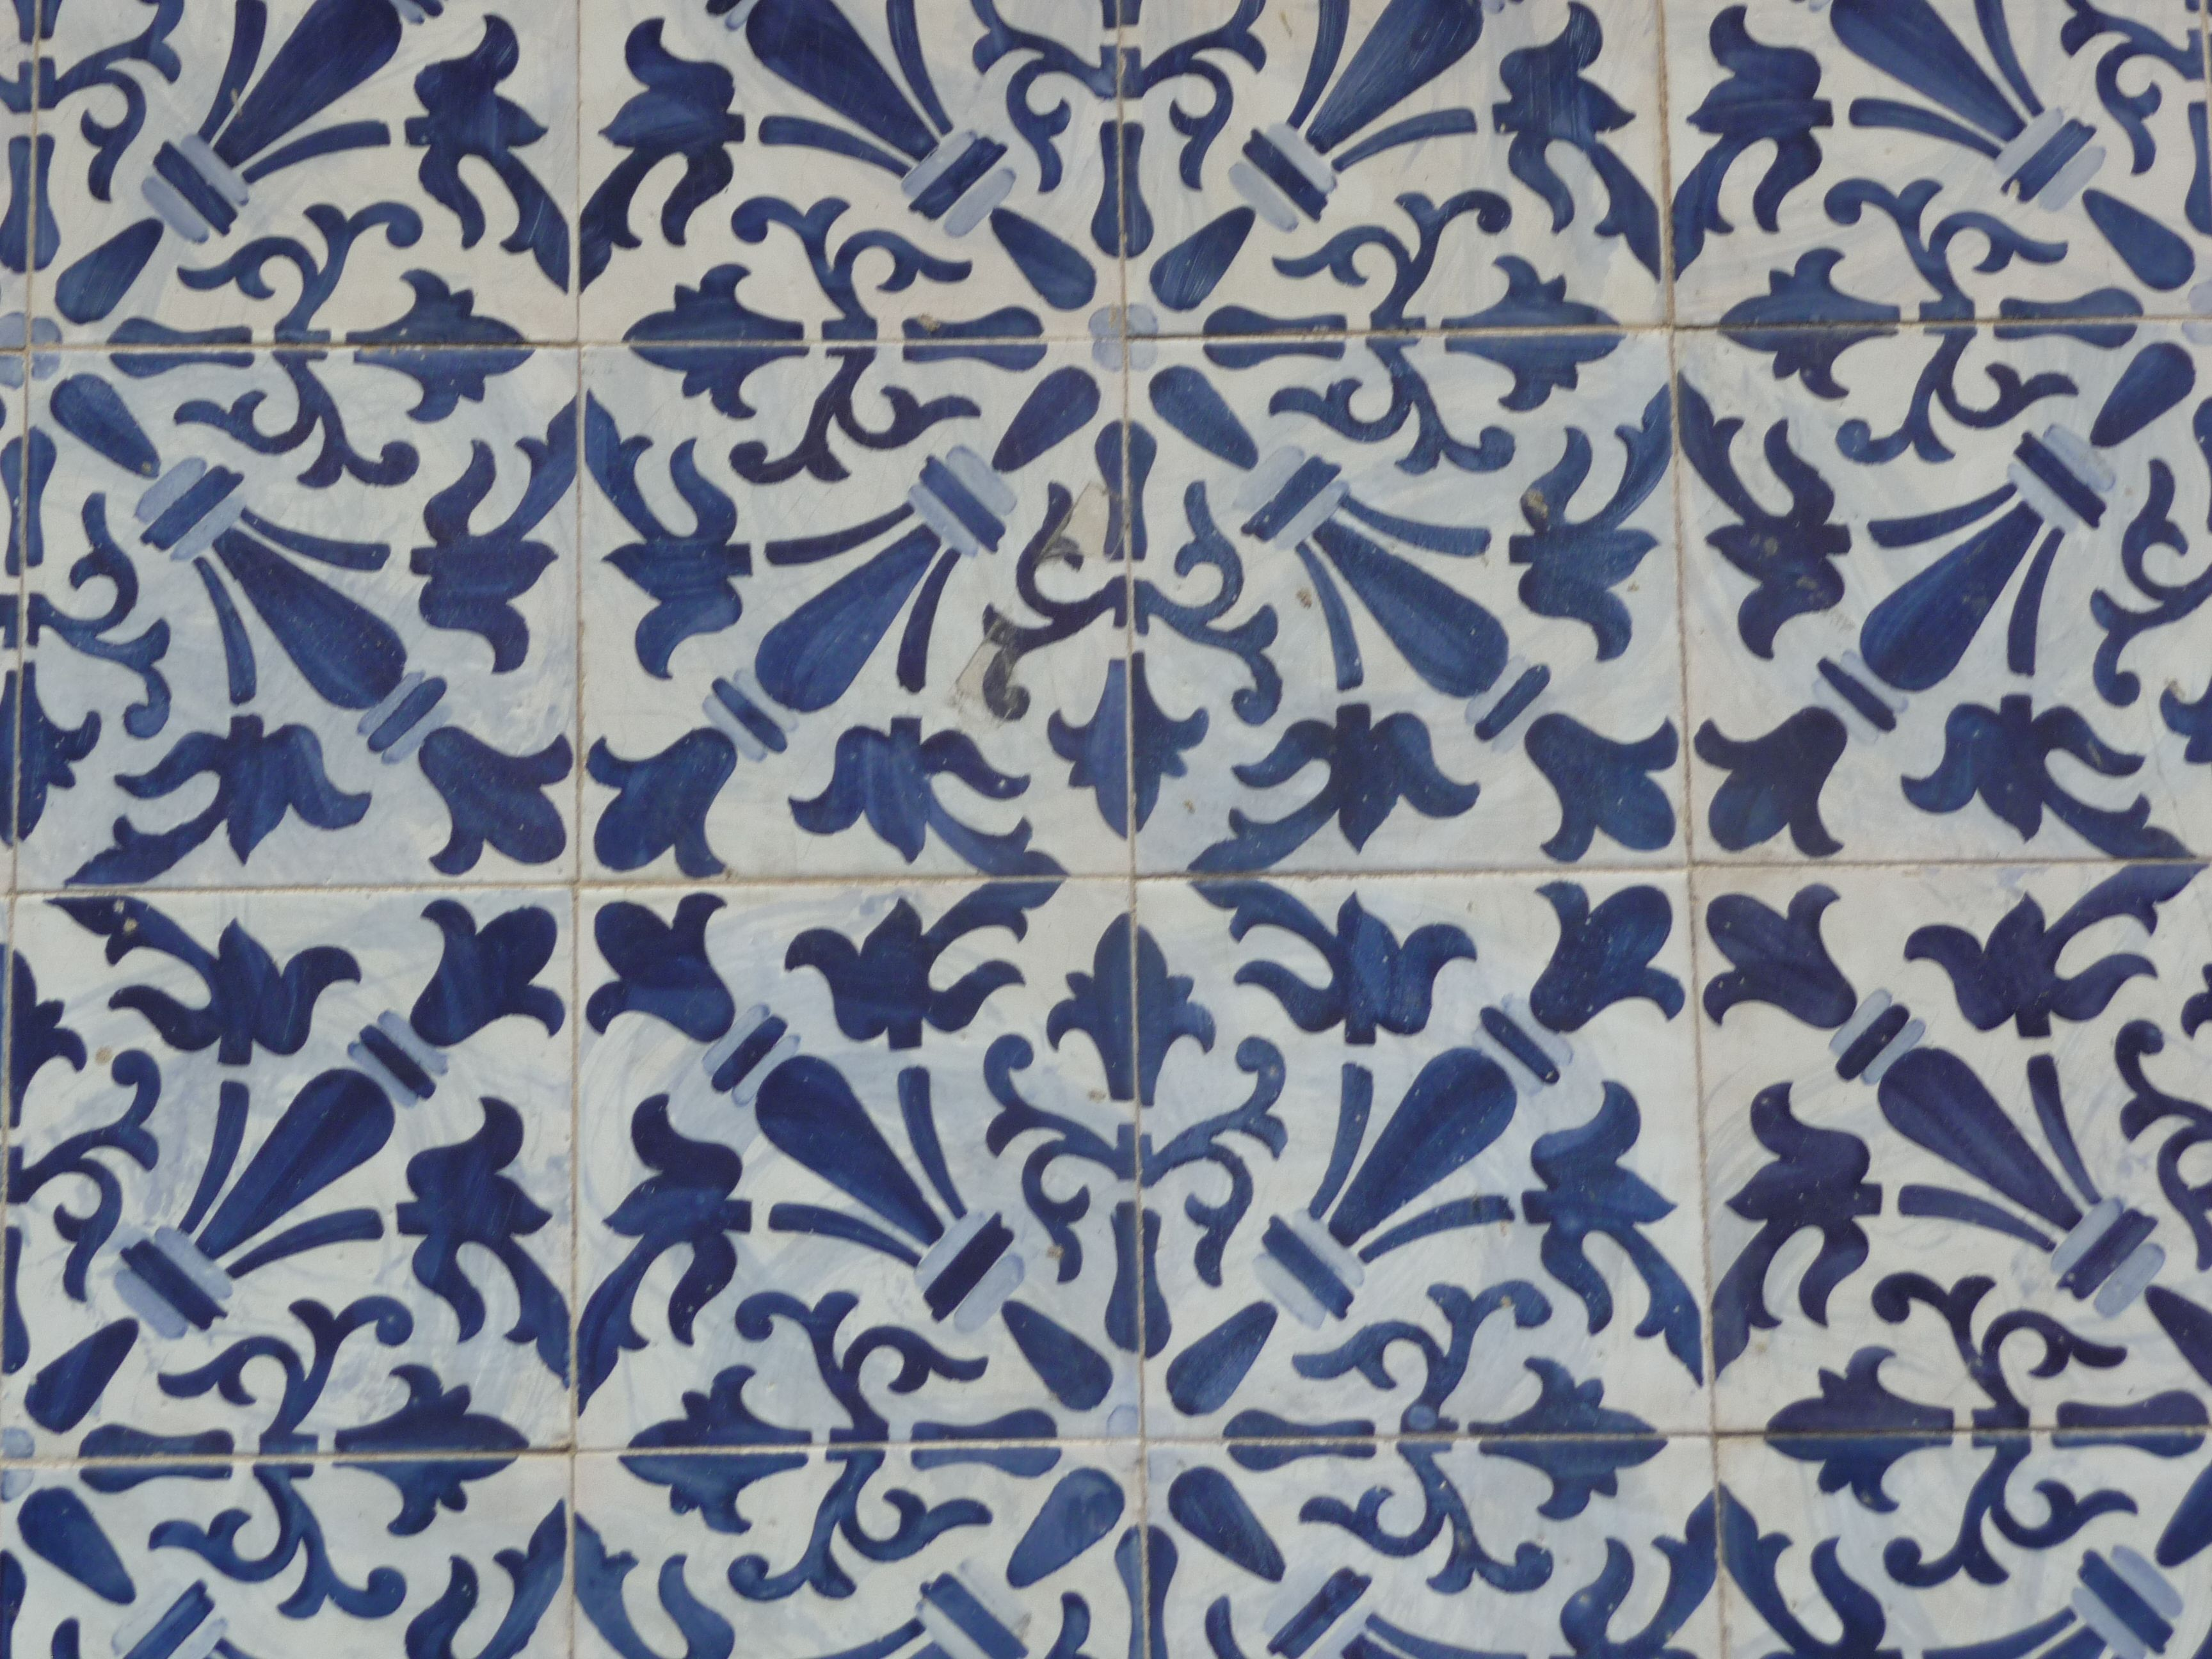 Decorative ceramic tiles \'azulejos\' of Lisbon | g l o b a l ...